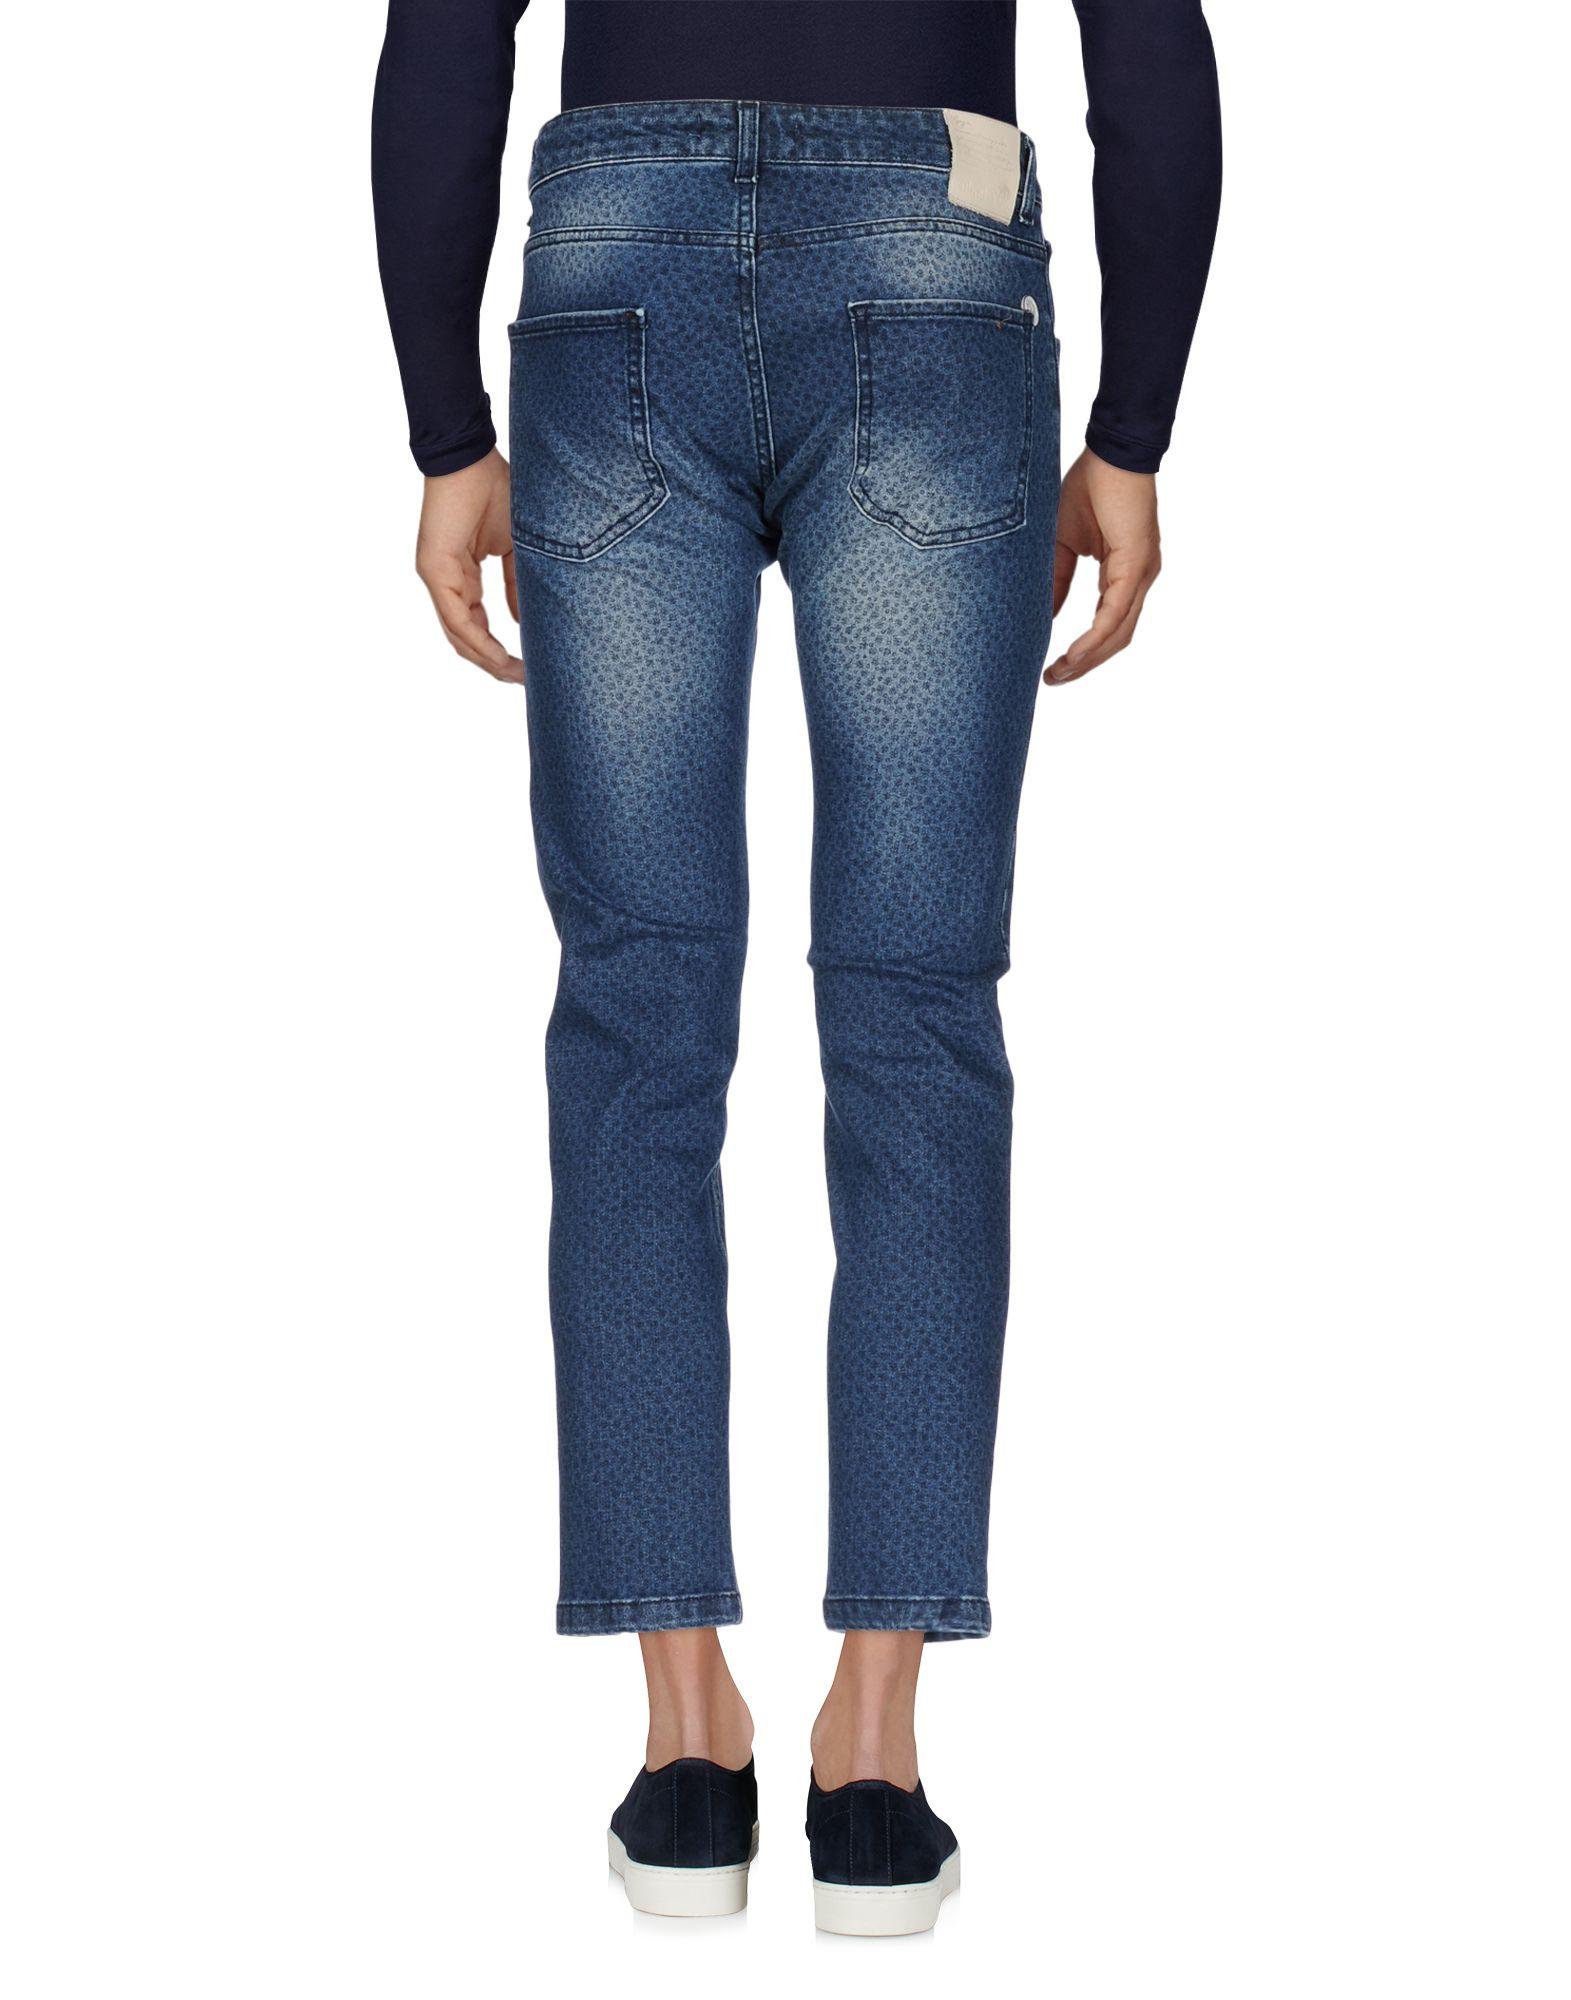 Pantaloni Jeans Entre Amis Uomo Uomo Amis - 42611184SA 1f7a61